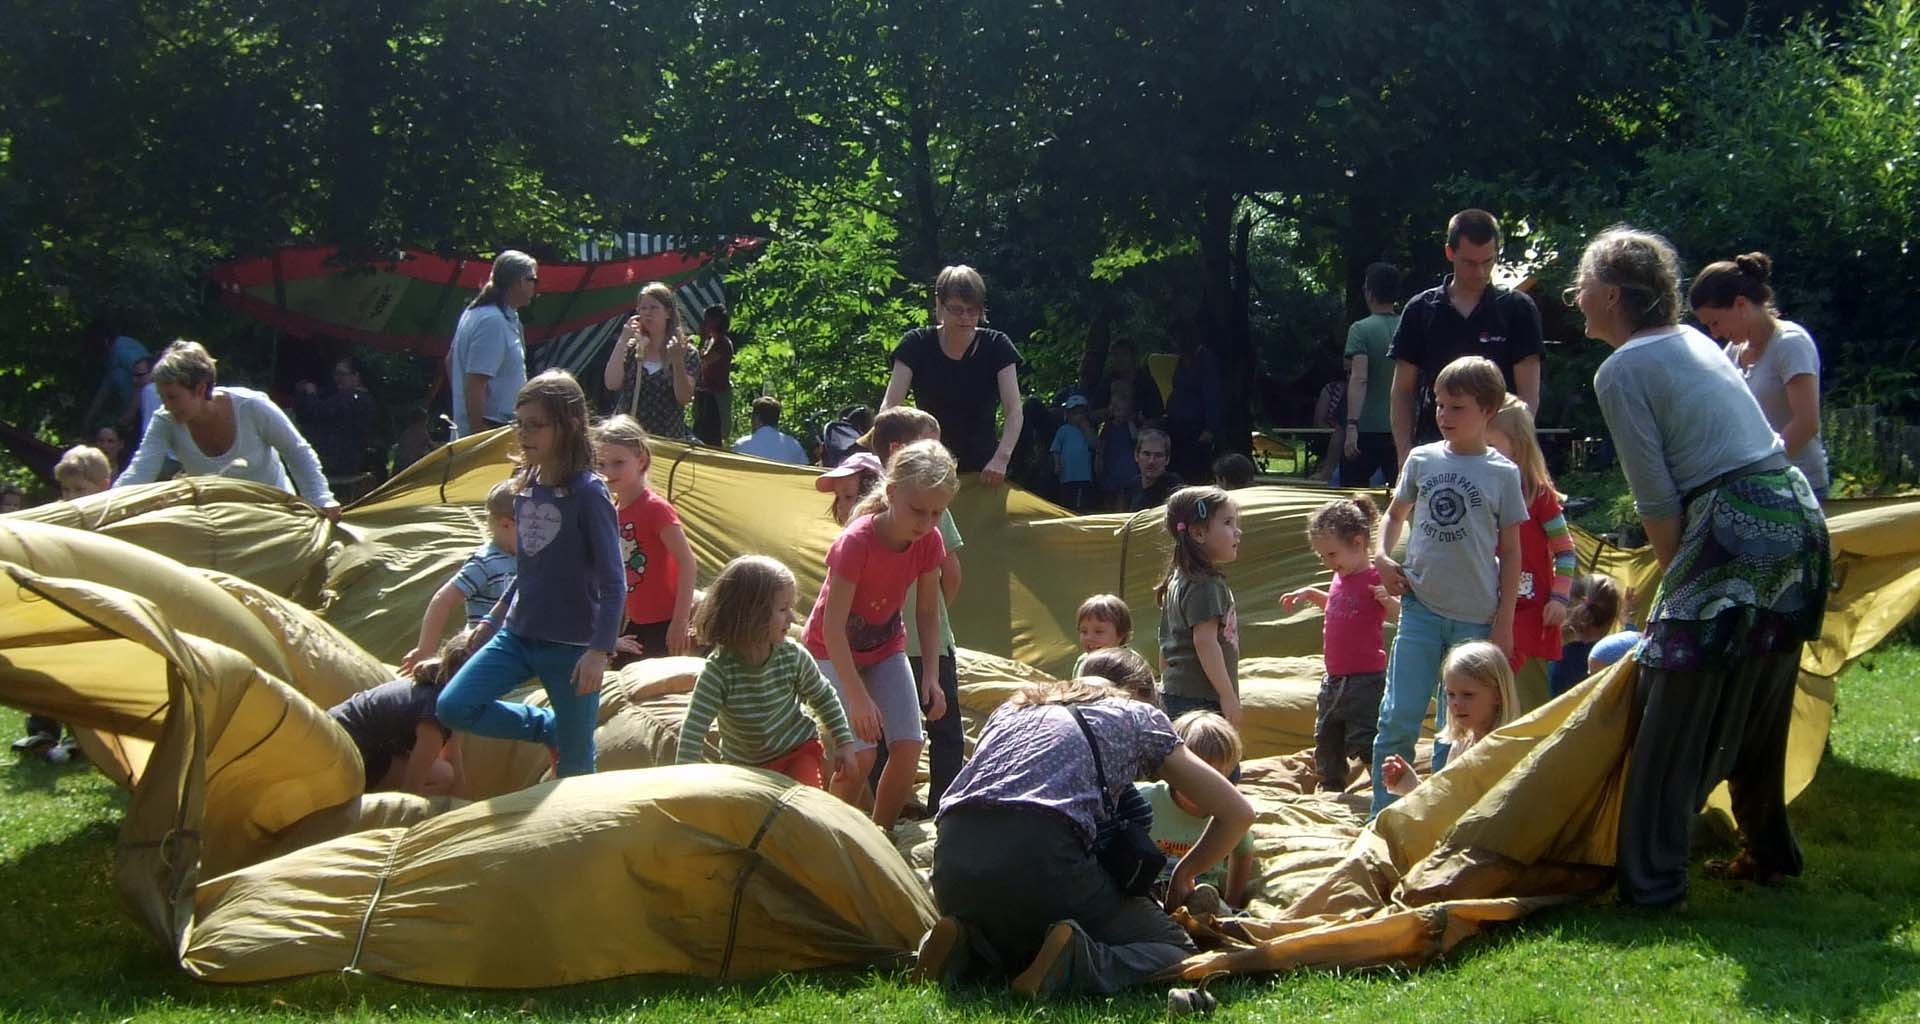 ElternKind|Sommerfest|Seitenheader